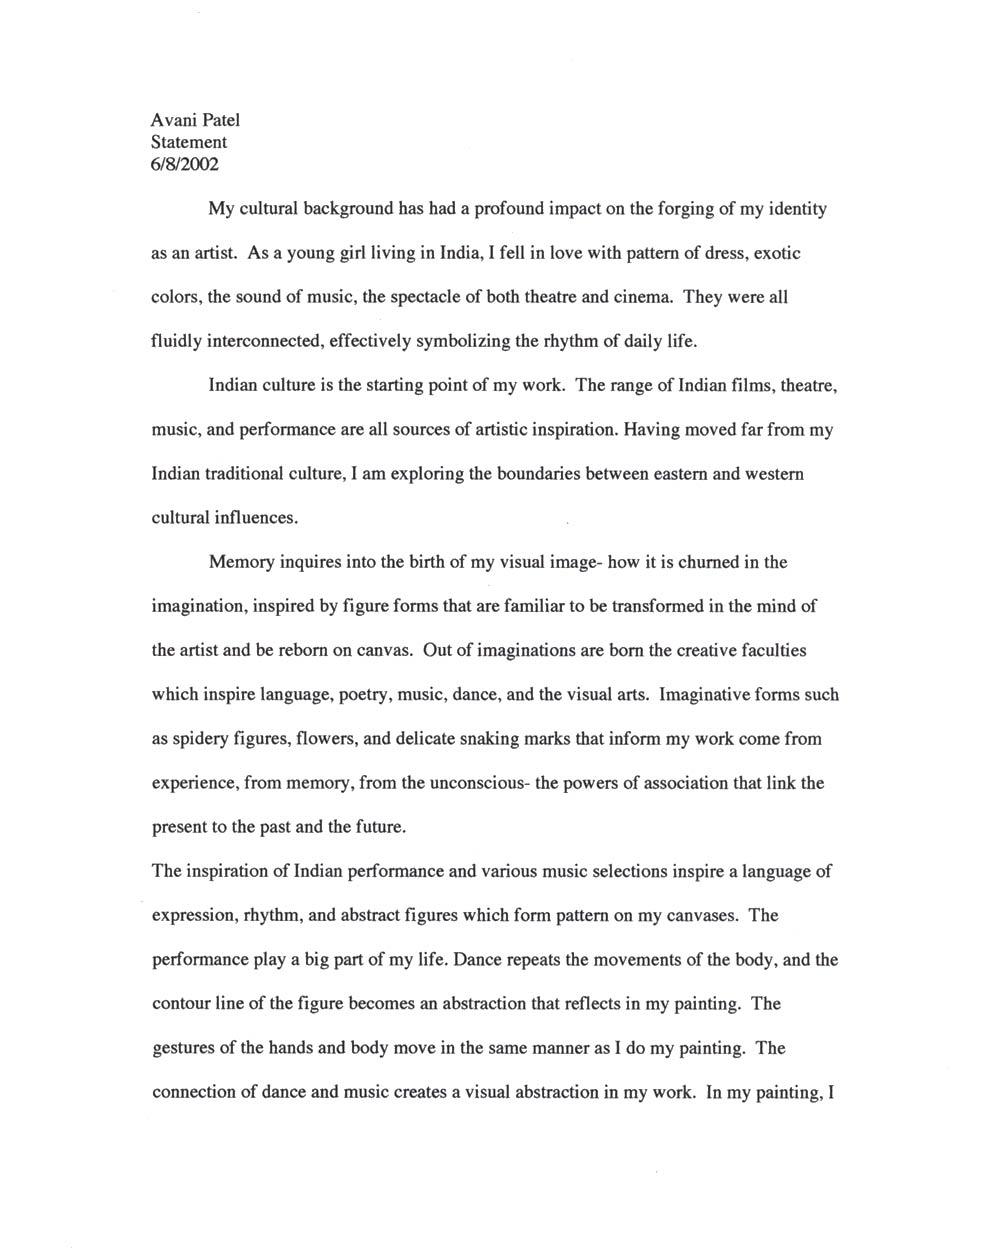 Avani Patel's Artist Statement, pg 1